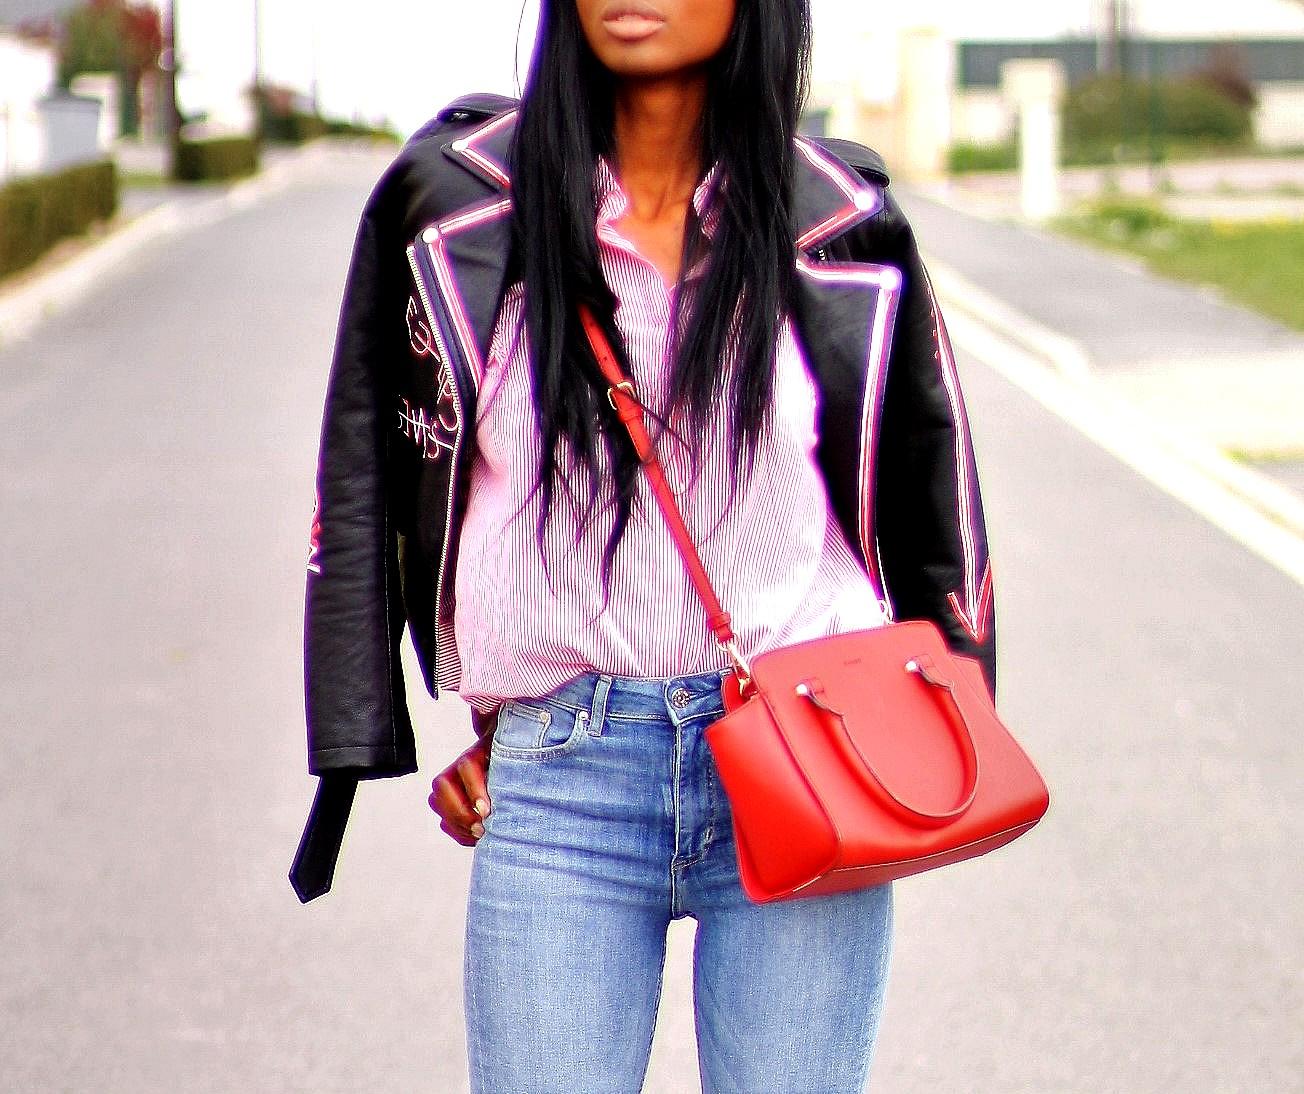 chemise-a-rayures-veste-en-cuir-jeans-taille-haute-style